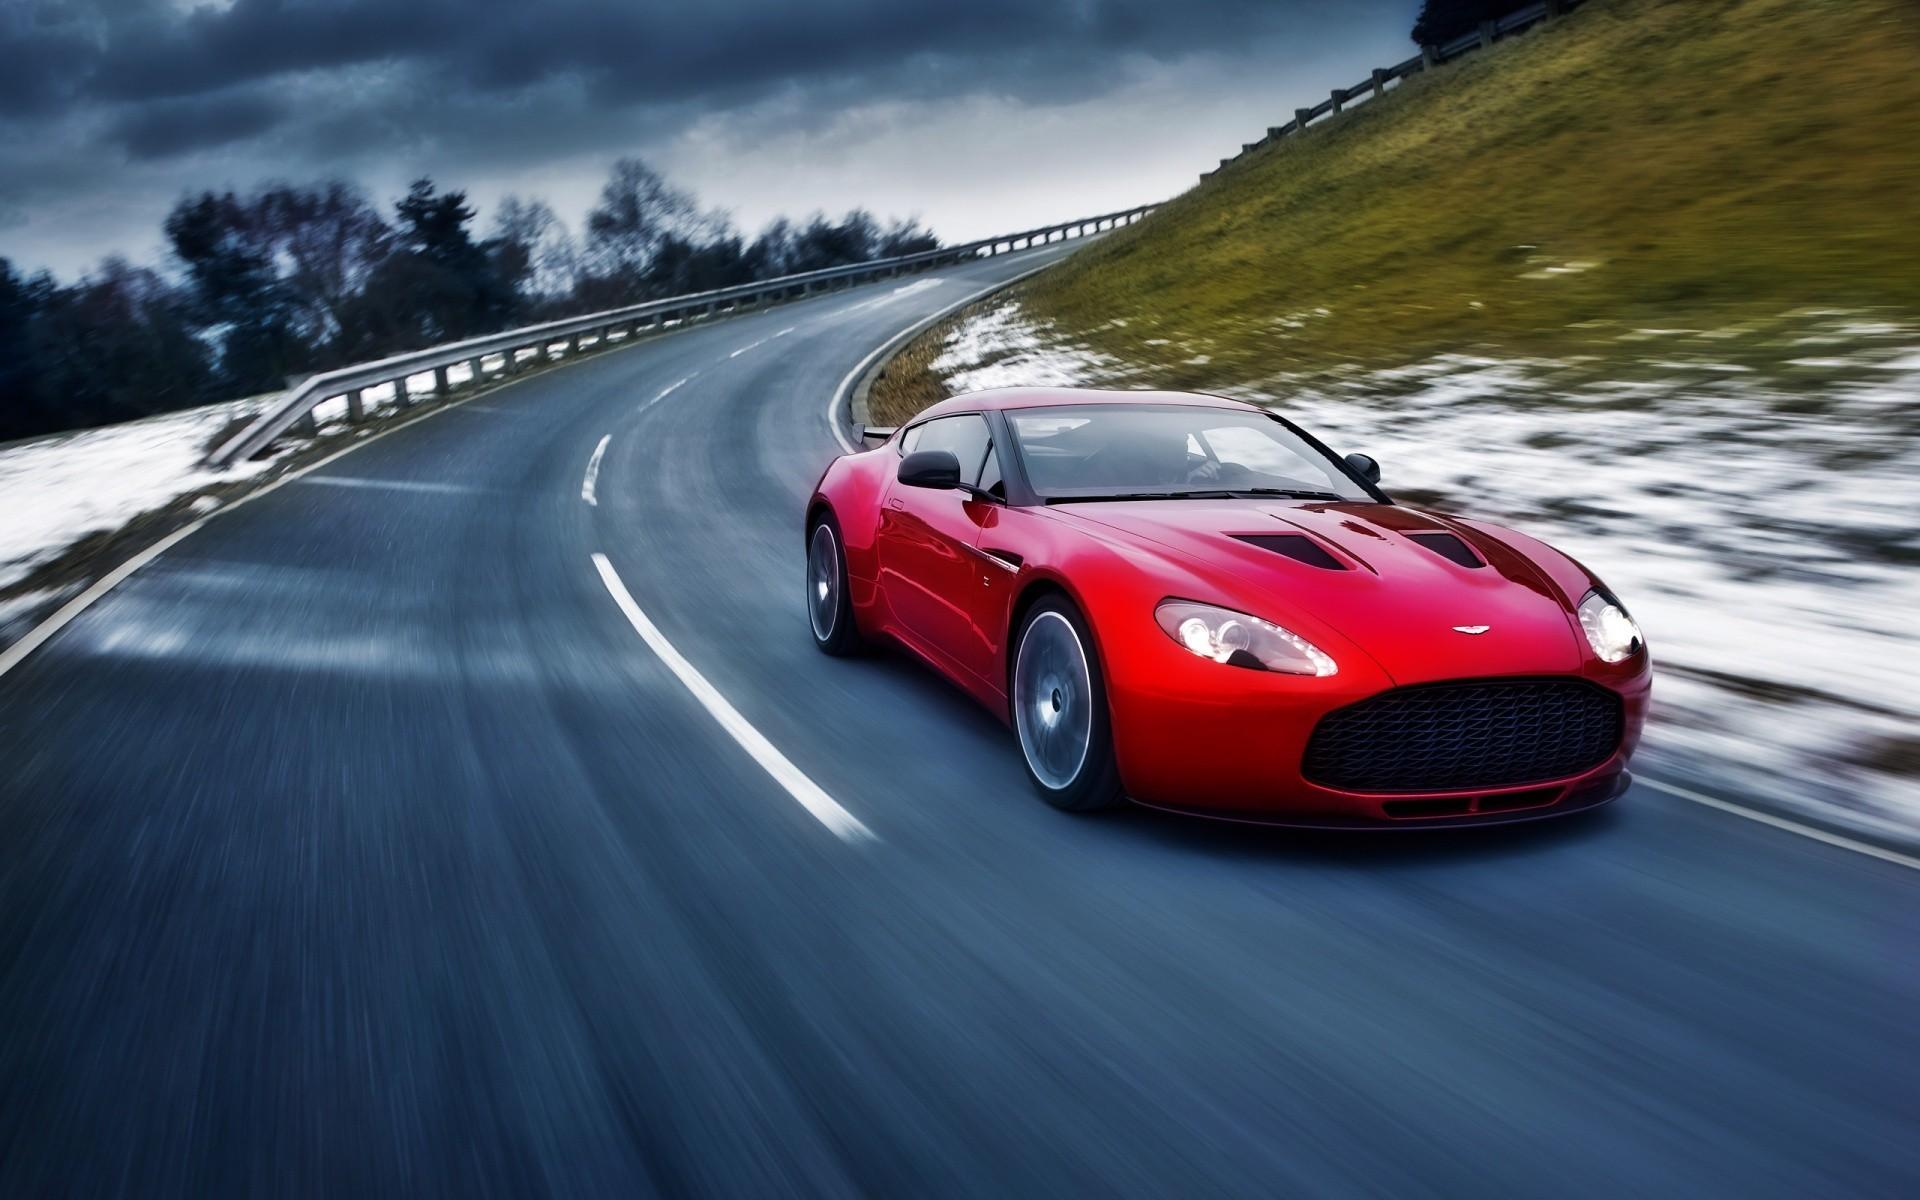 Wallpaper Of Sports Cars Luxury 2012 Aston Martin V8 Vantage Computer  Wallpapers